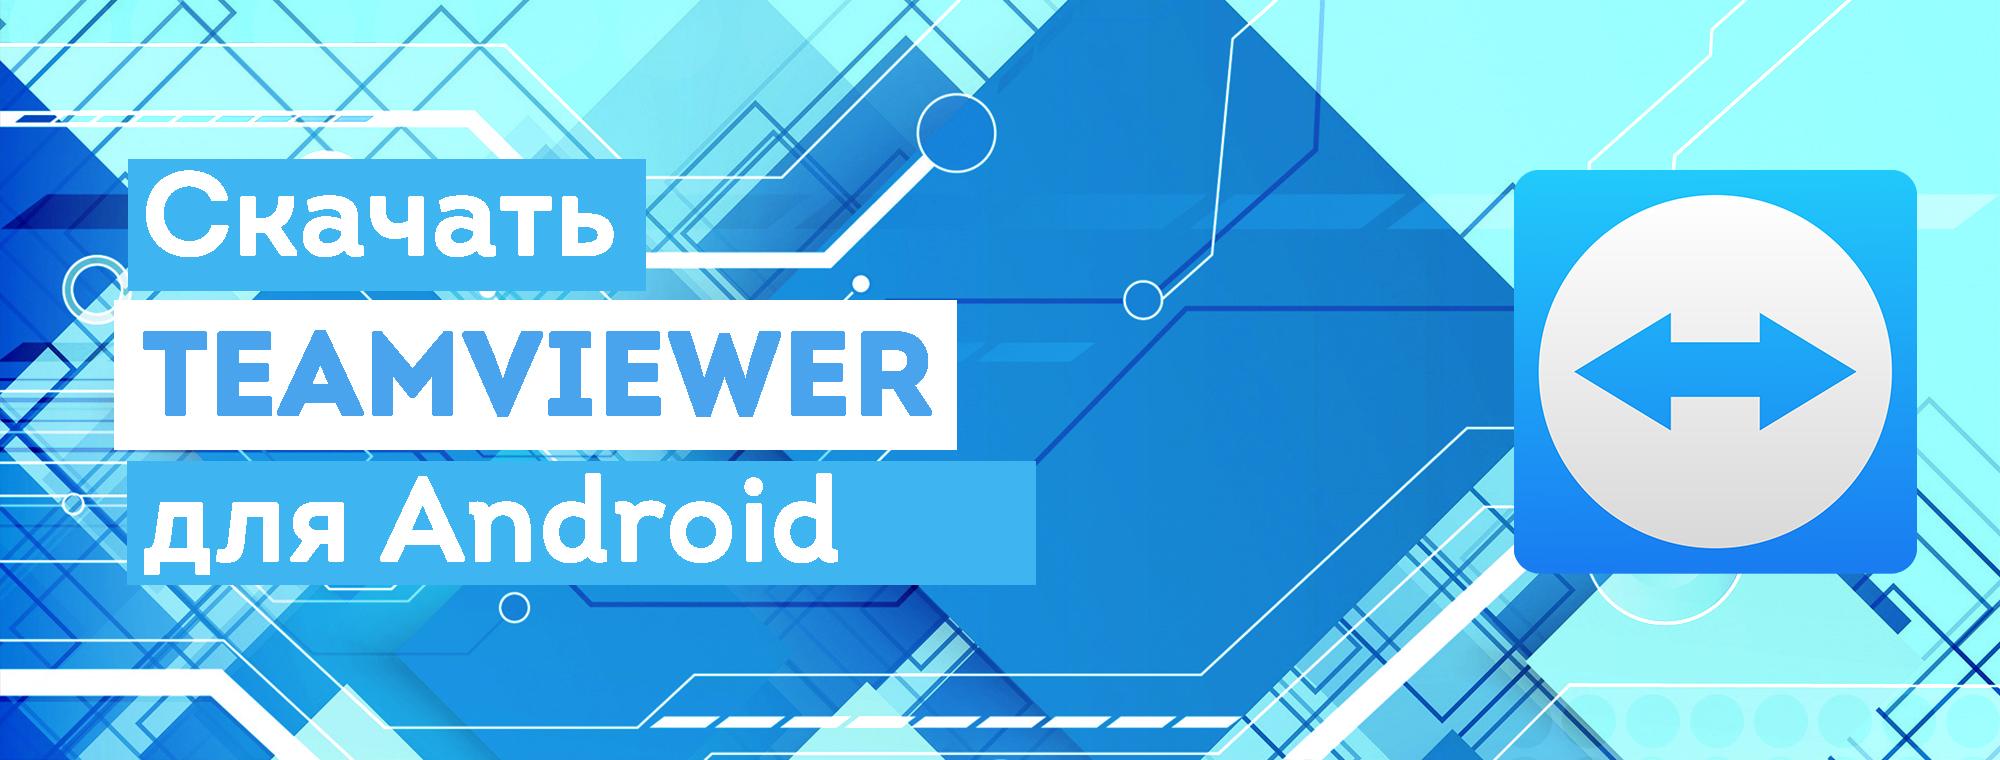 Скачать Teamviewer для Android